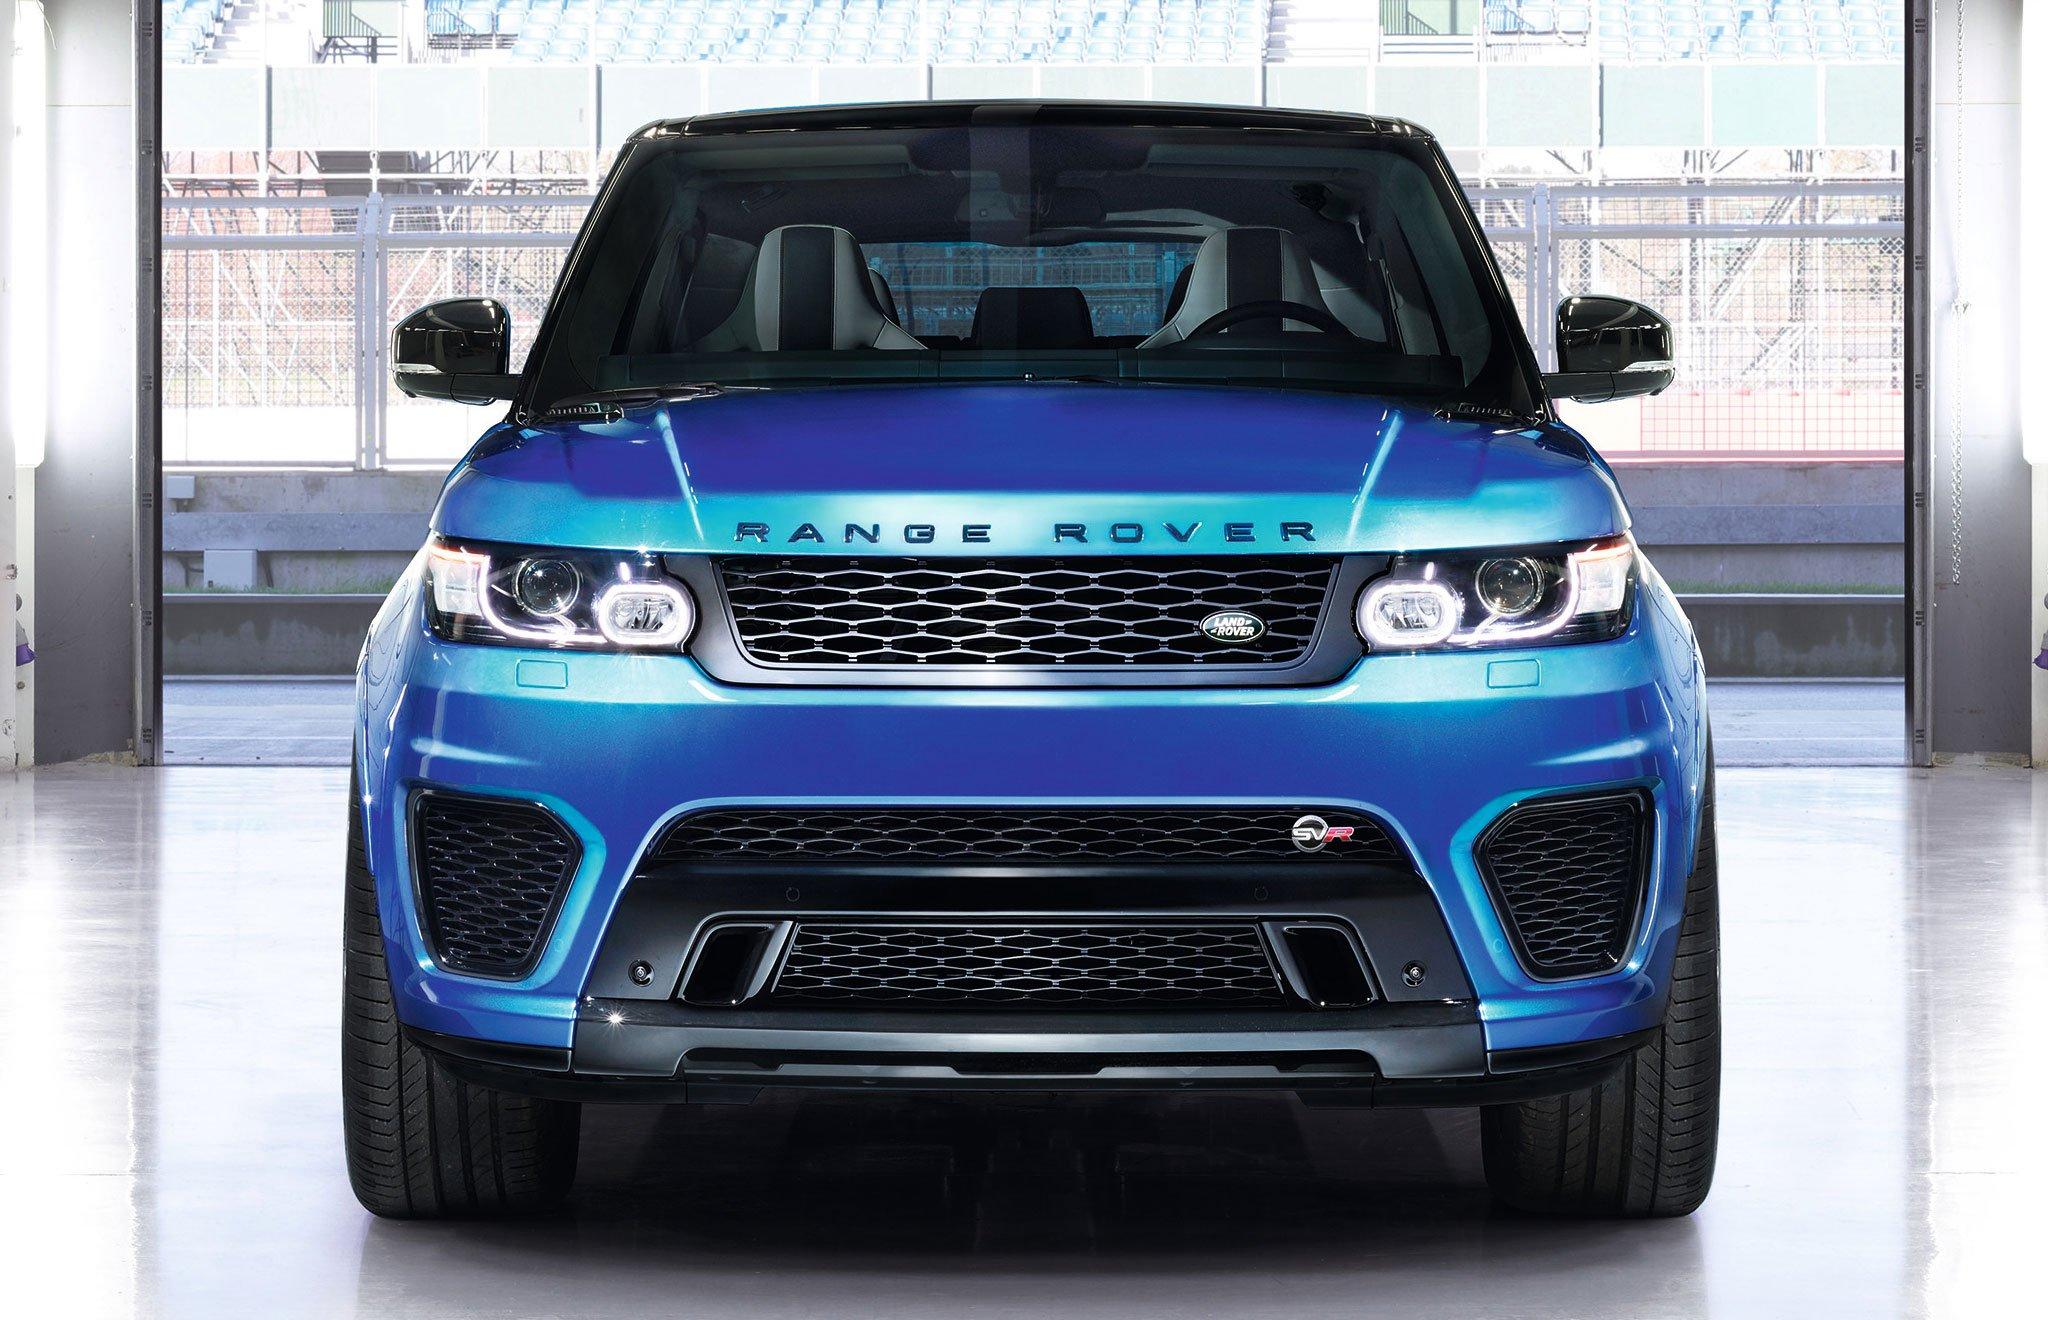 Range Rover Svr For Sale >> Range Rover Sport SVR – the fastest Land Rover, ever